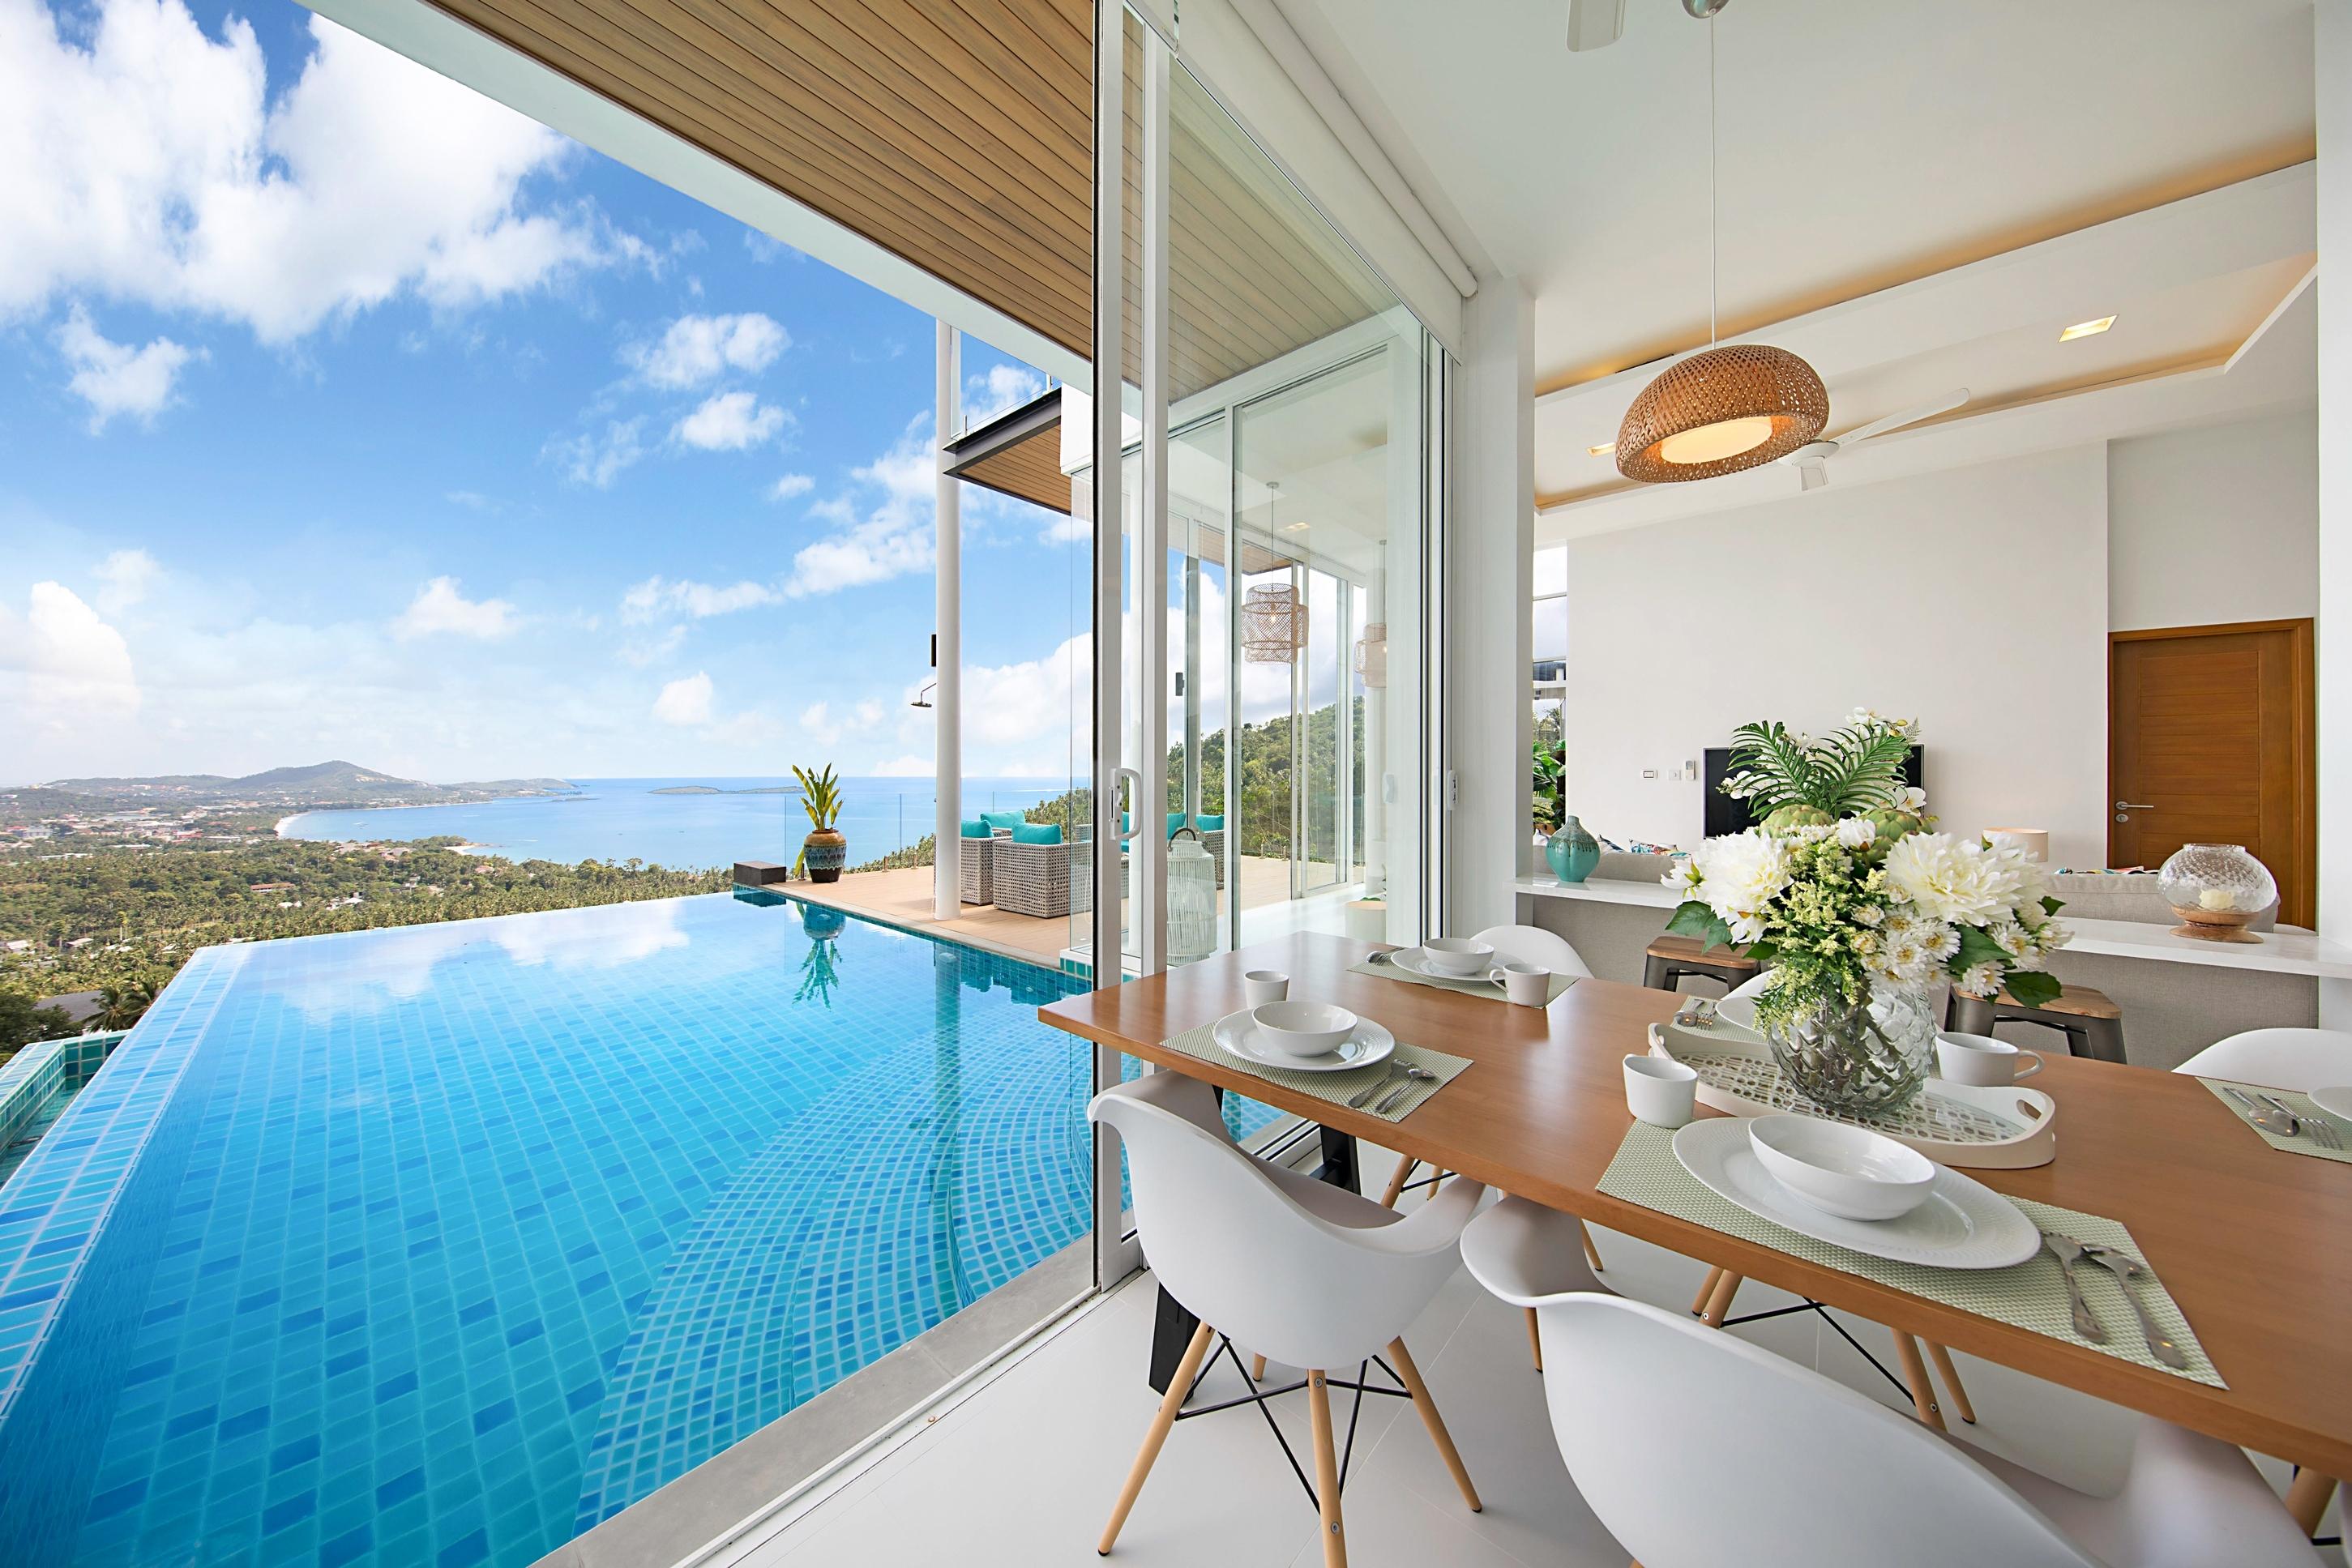 The blue sea villa looks just heavenly